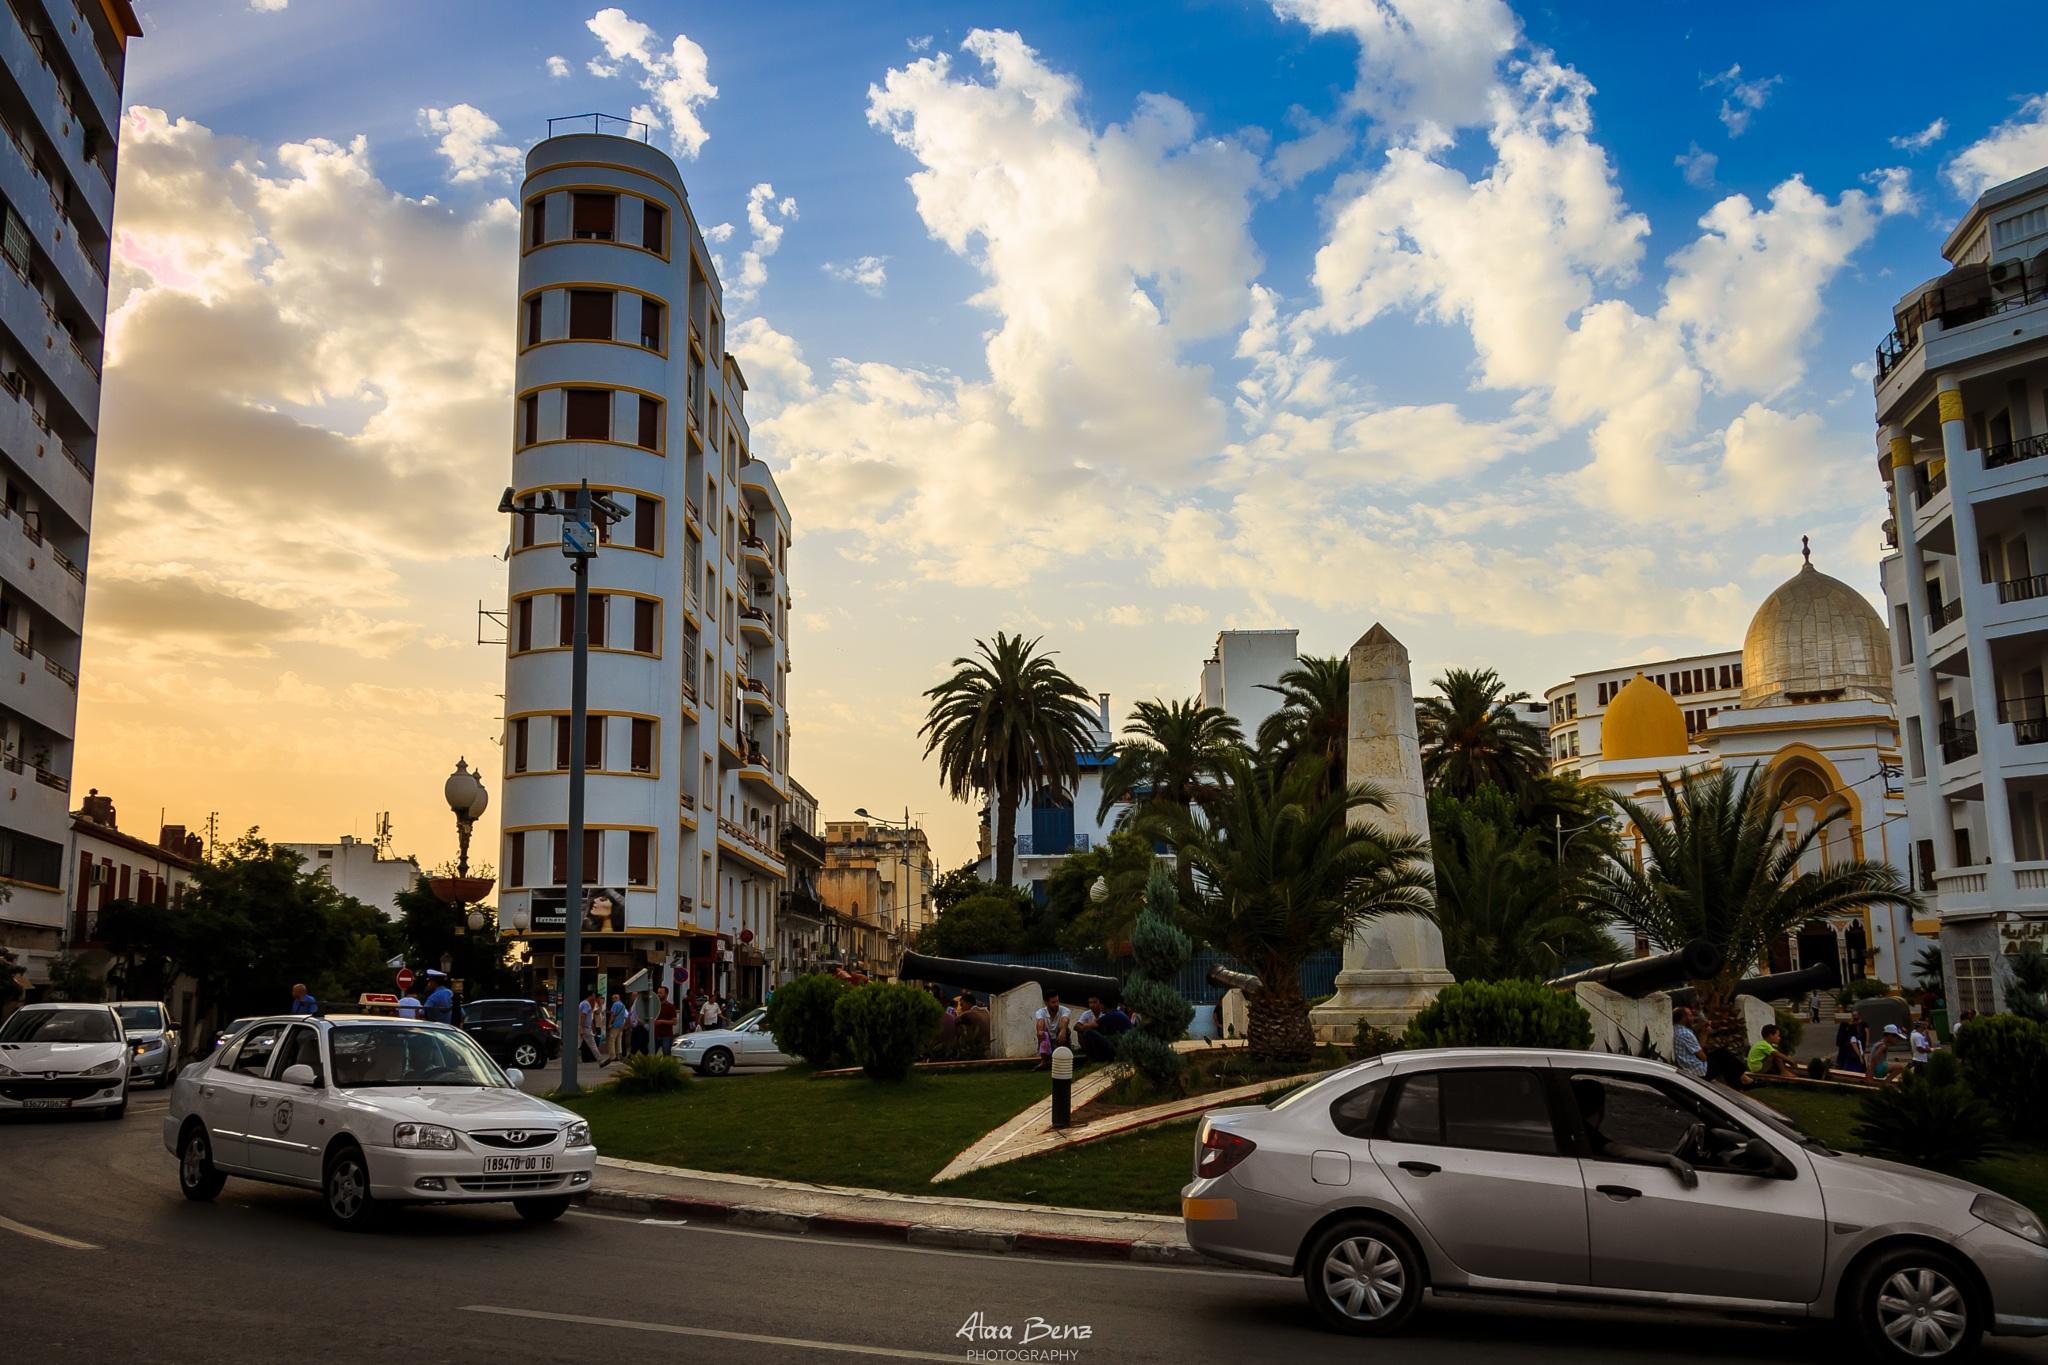 Constantine, Algeria by Alaabenz